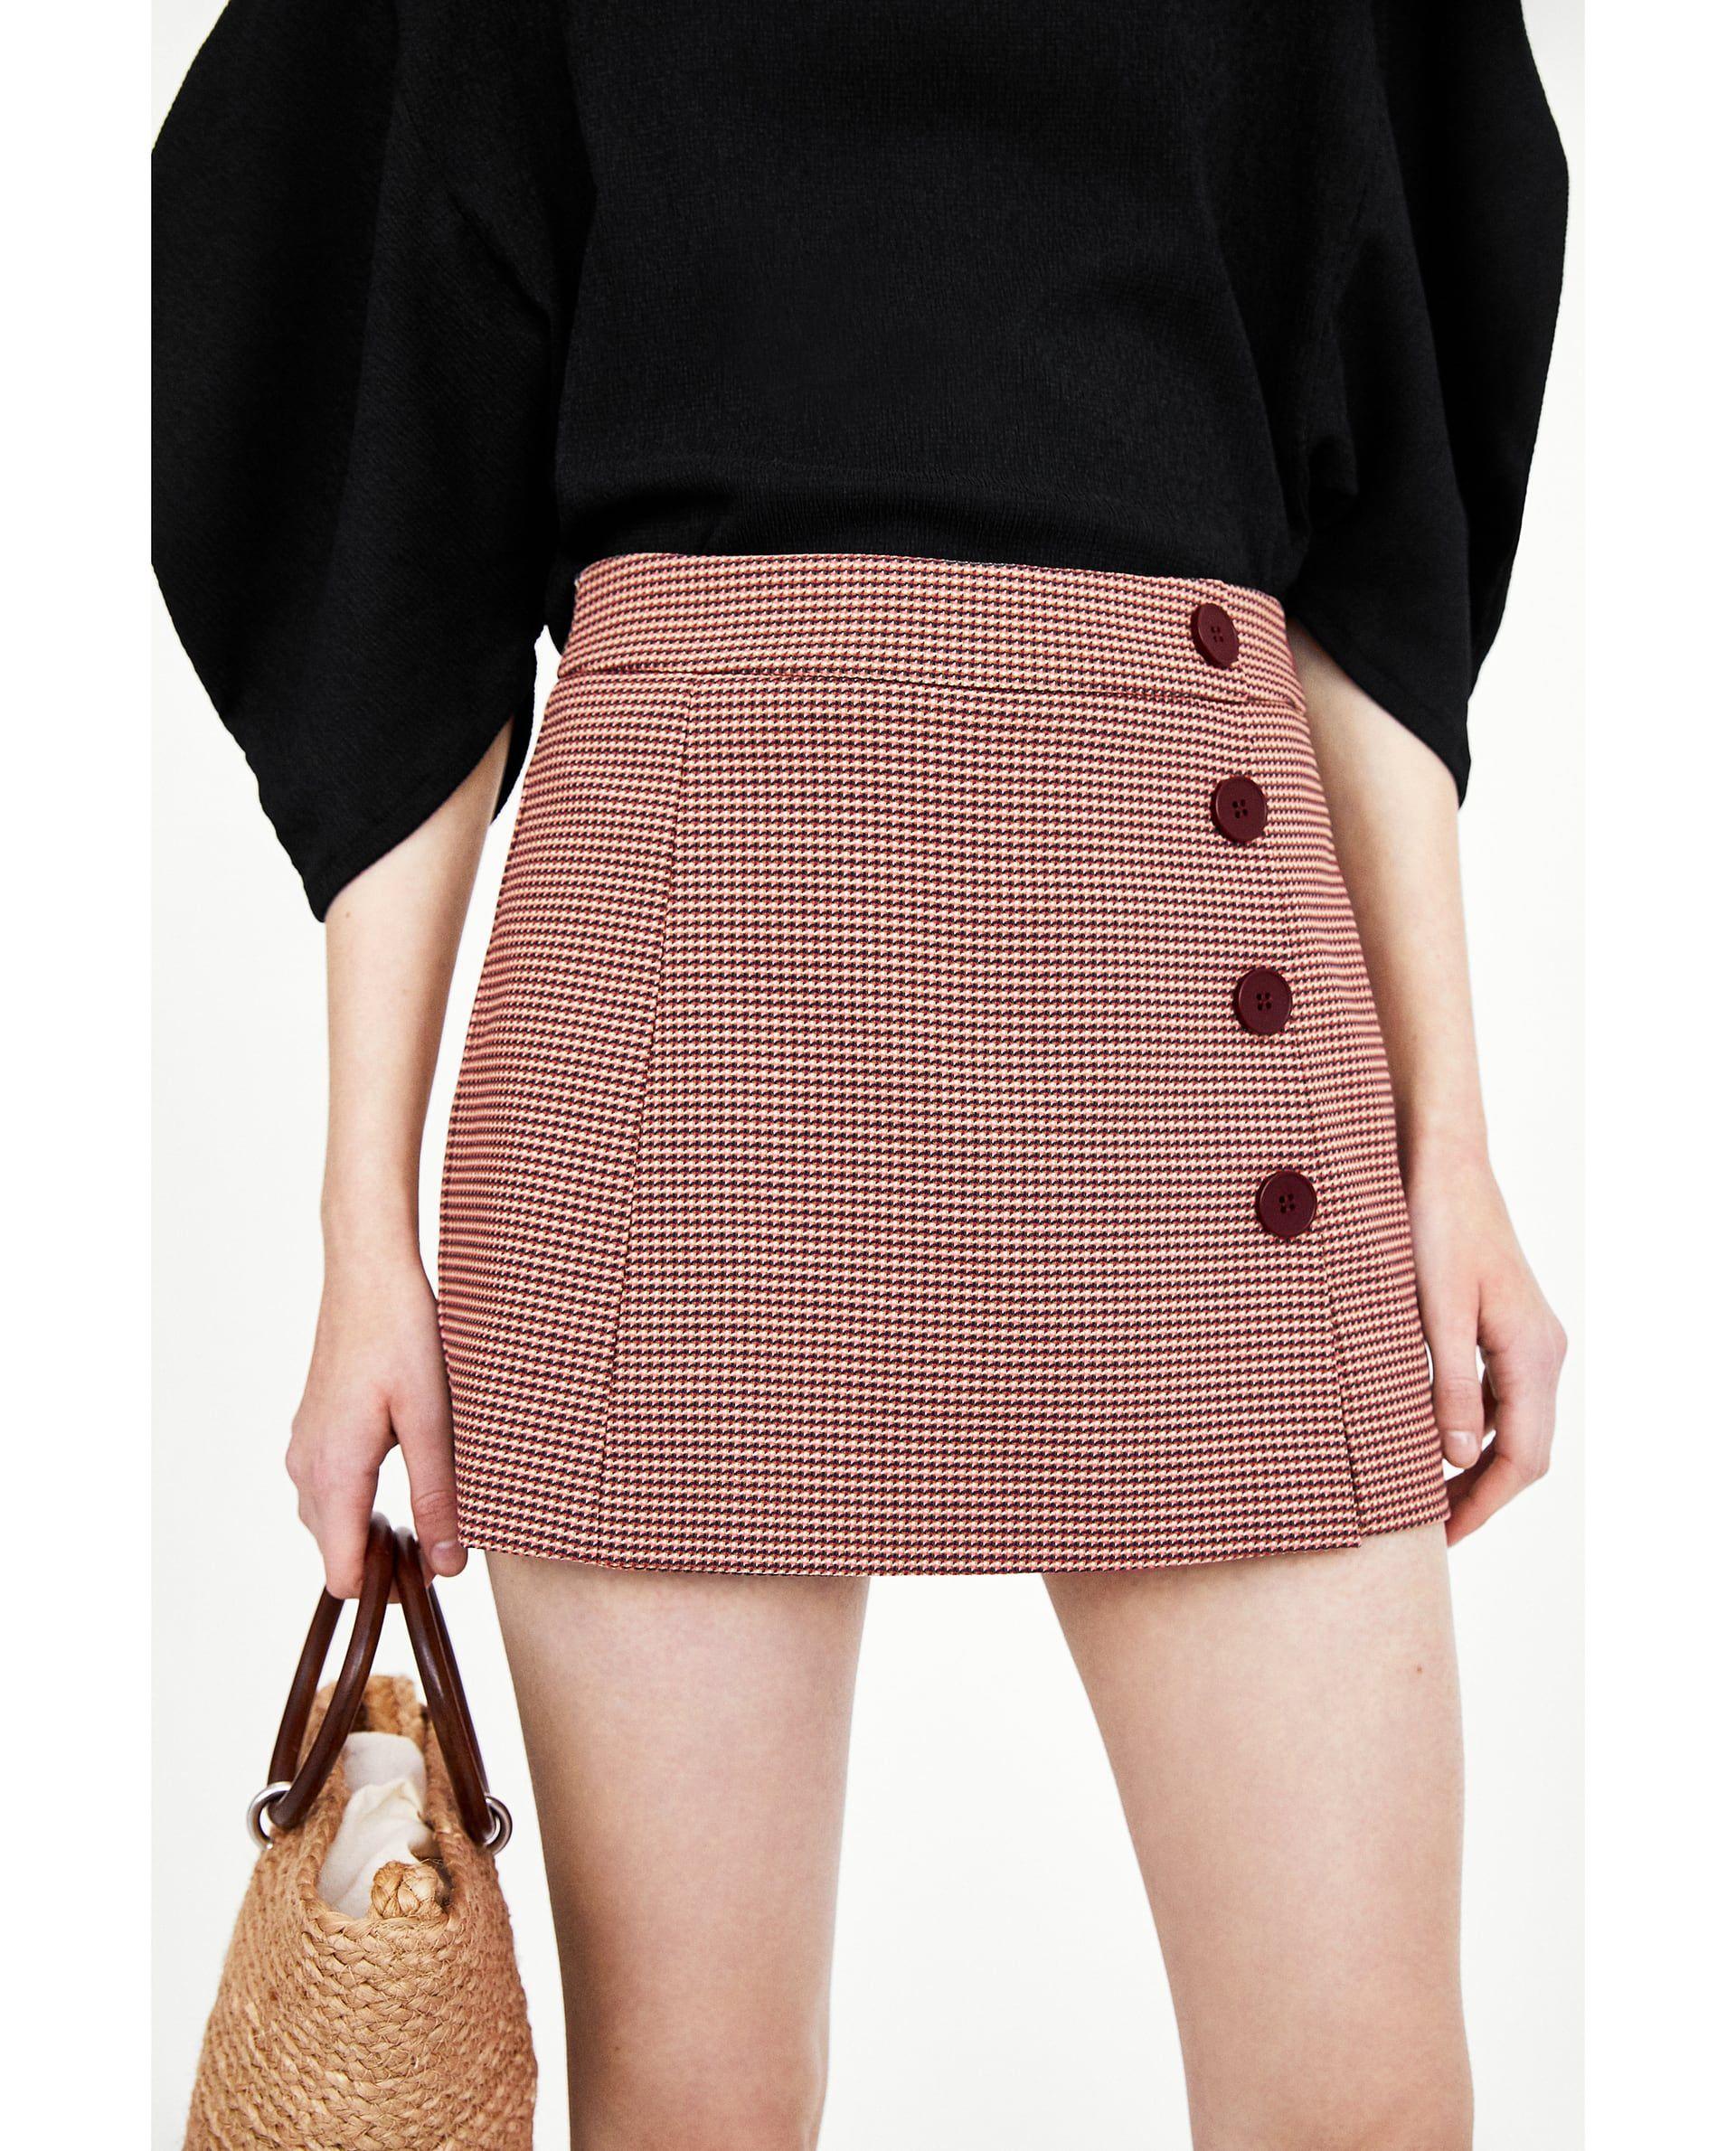 055d24e5 Image 3 of BUTTONED SKORT from Zara | fshn & styl in 2019 | Skort ...